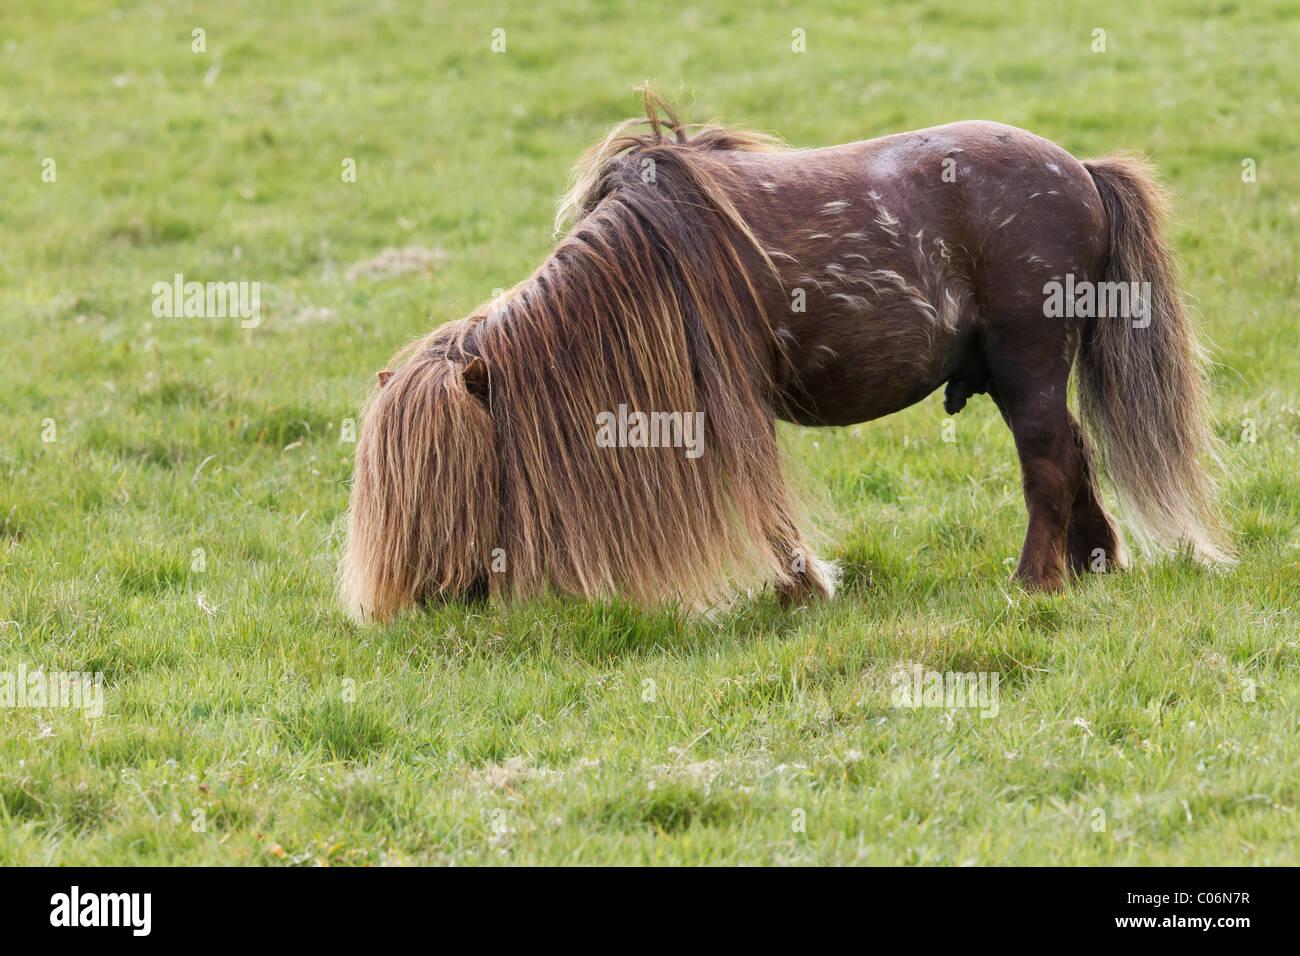 Shetland pony stallion - Stock Image